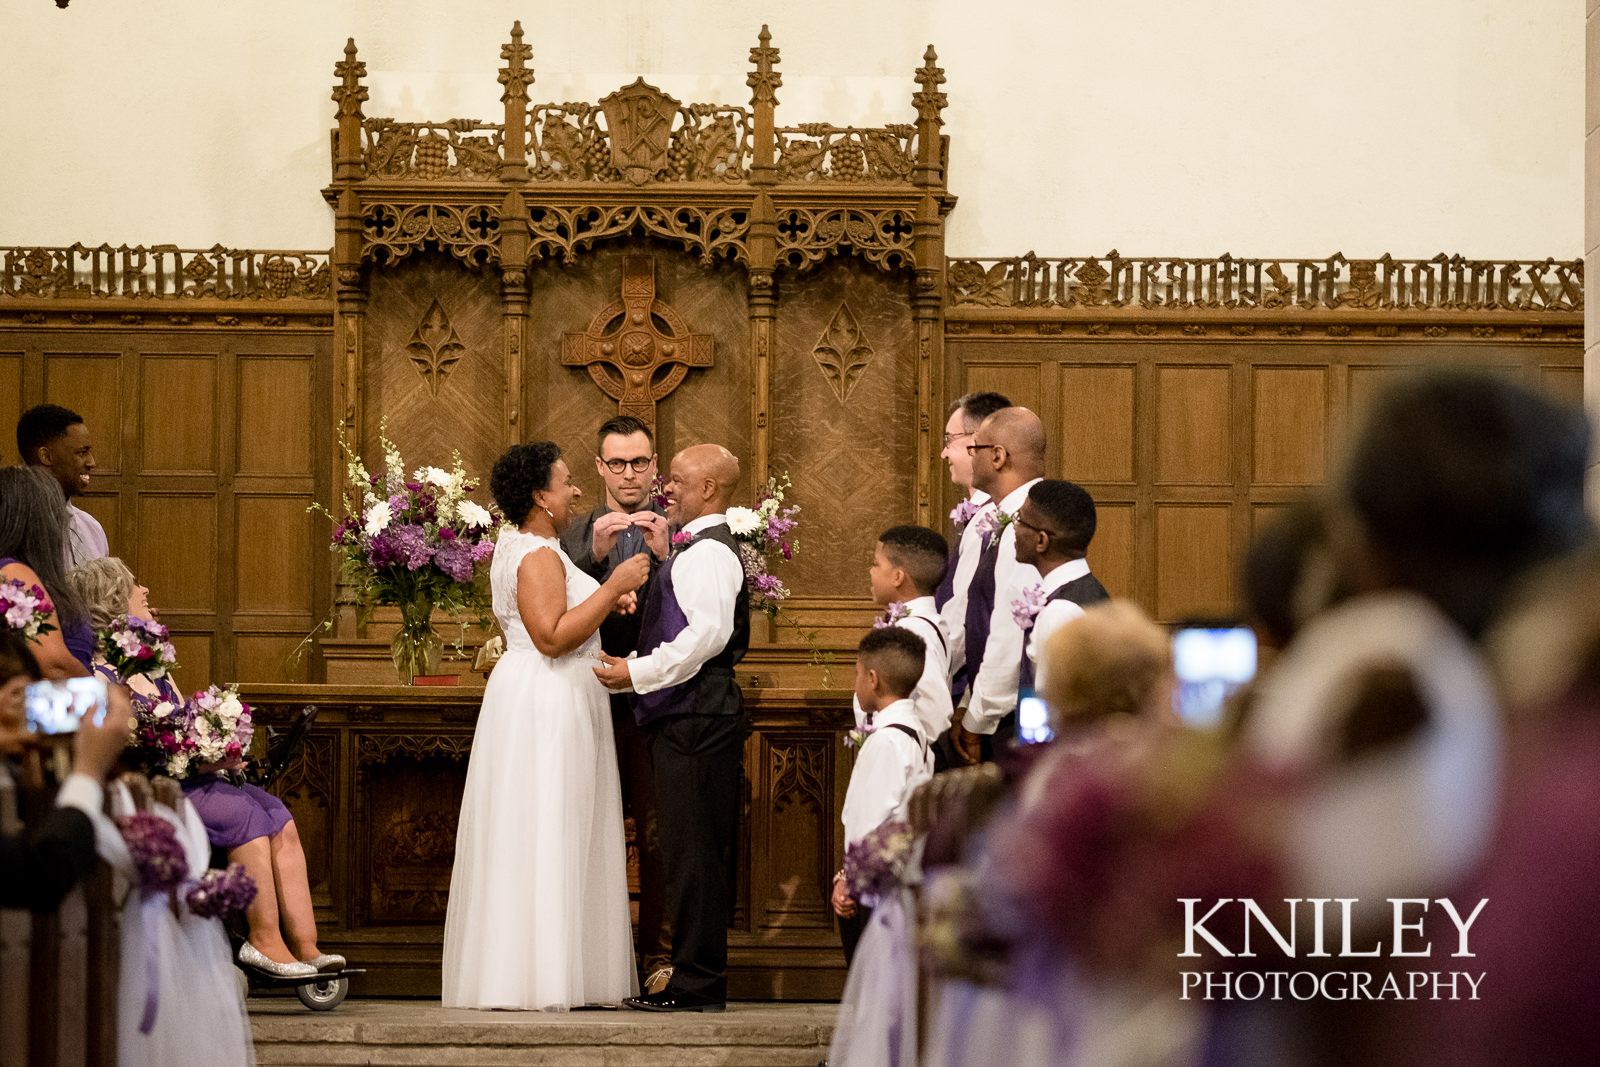 Rochester Colgate Divinity School Wedding - Classic Rochester NY Wedding - 027-XT2A4590.jpg